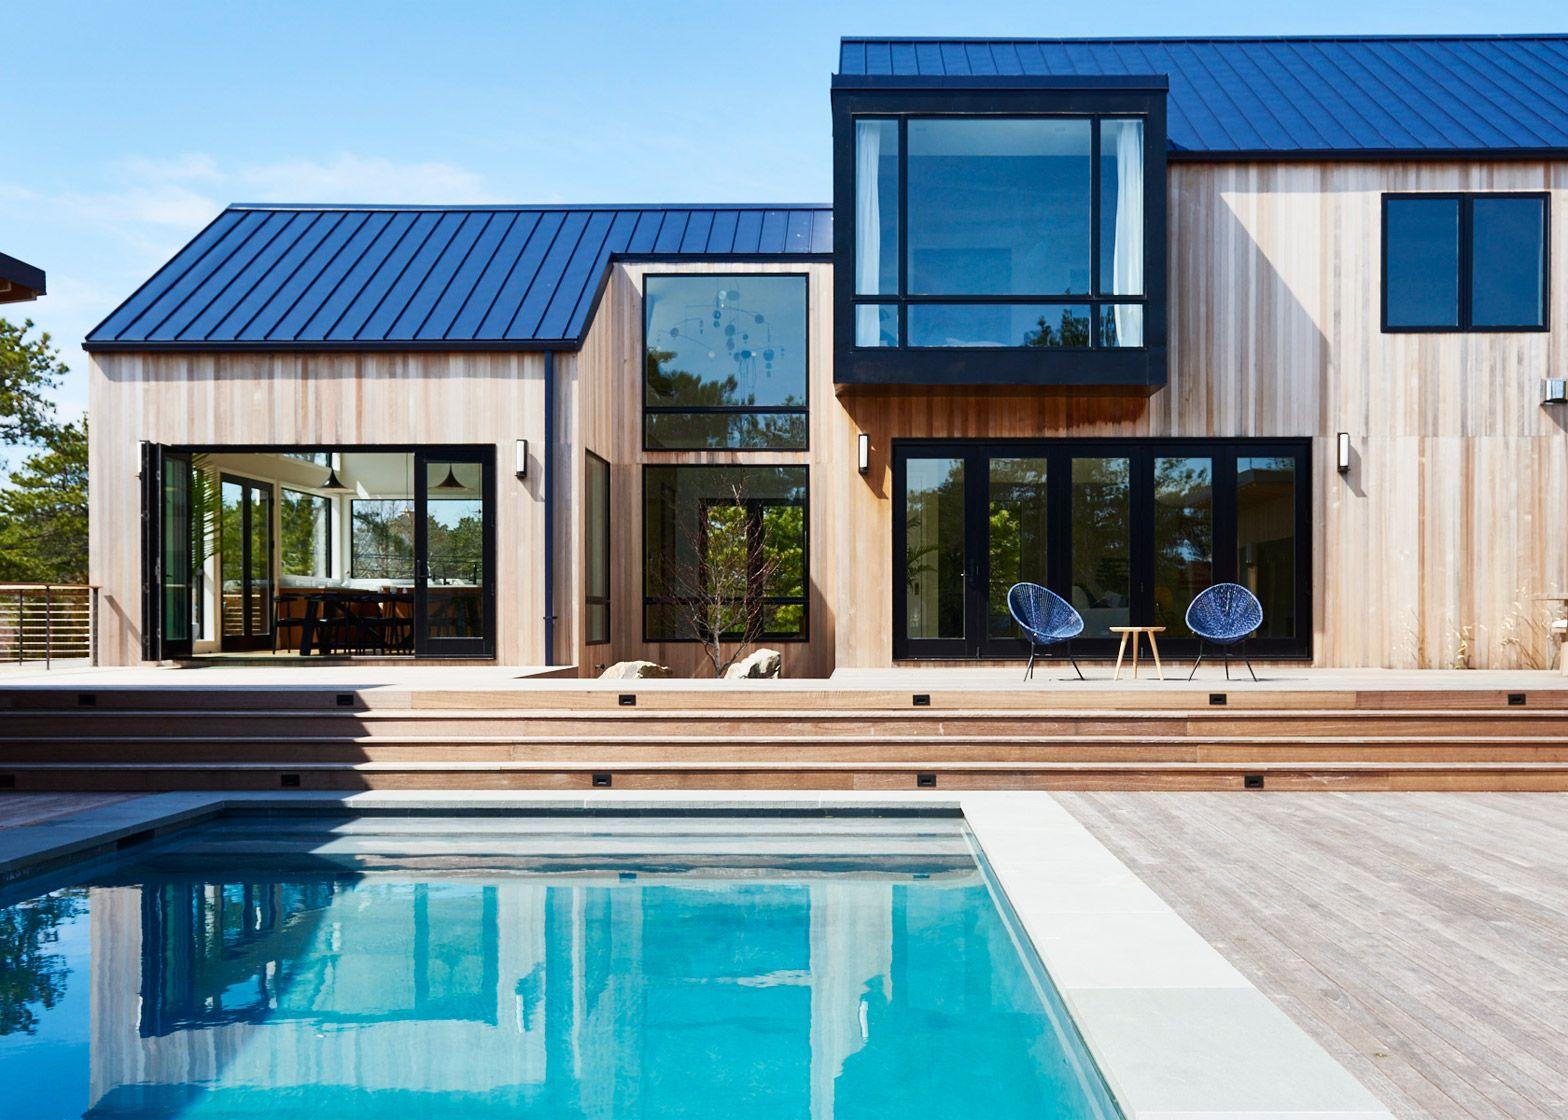 Studio Zung creates cedar-clad \